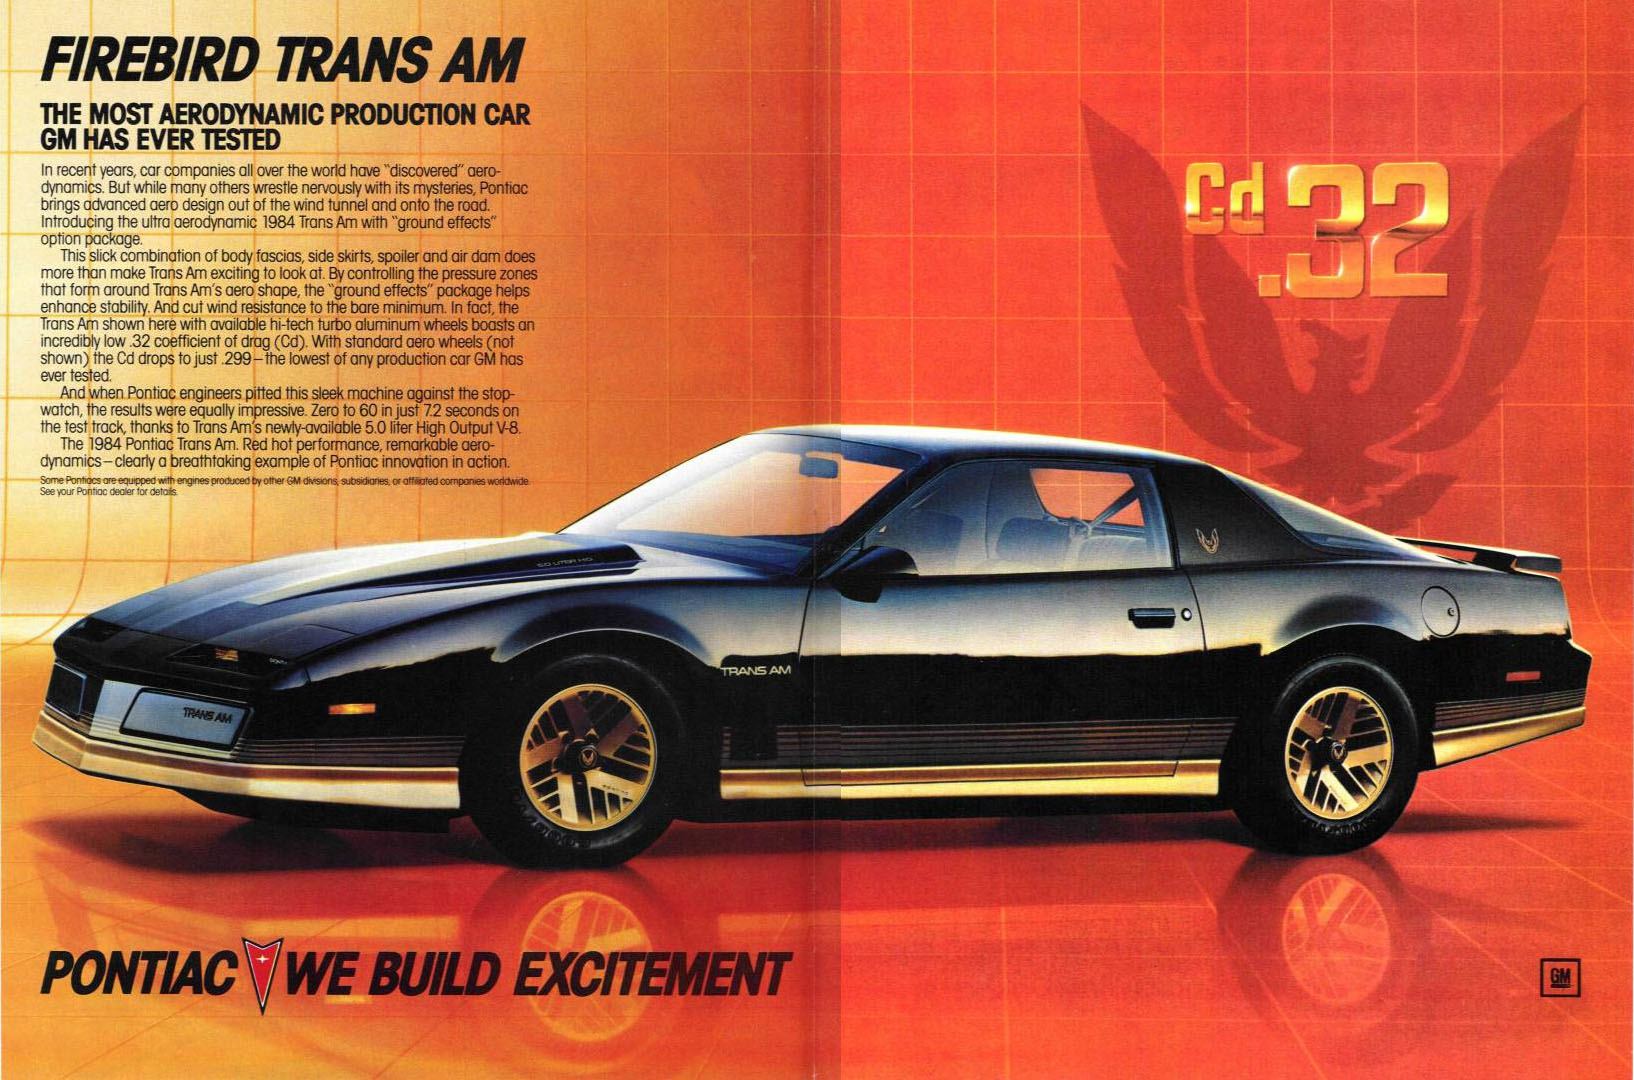 84 Am Convertible Trans